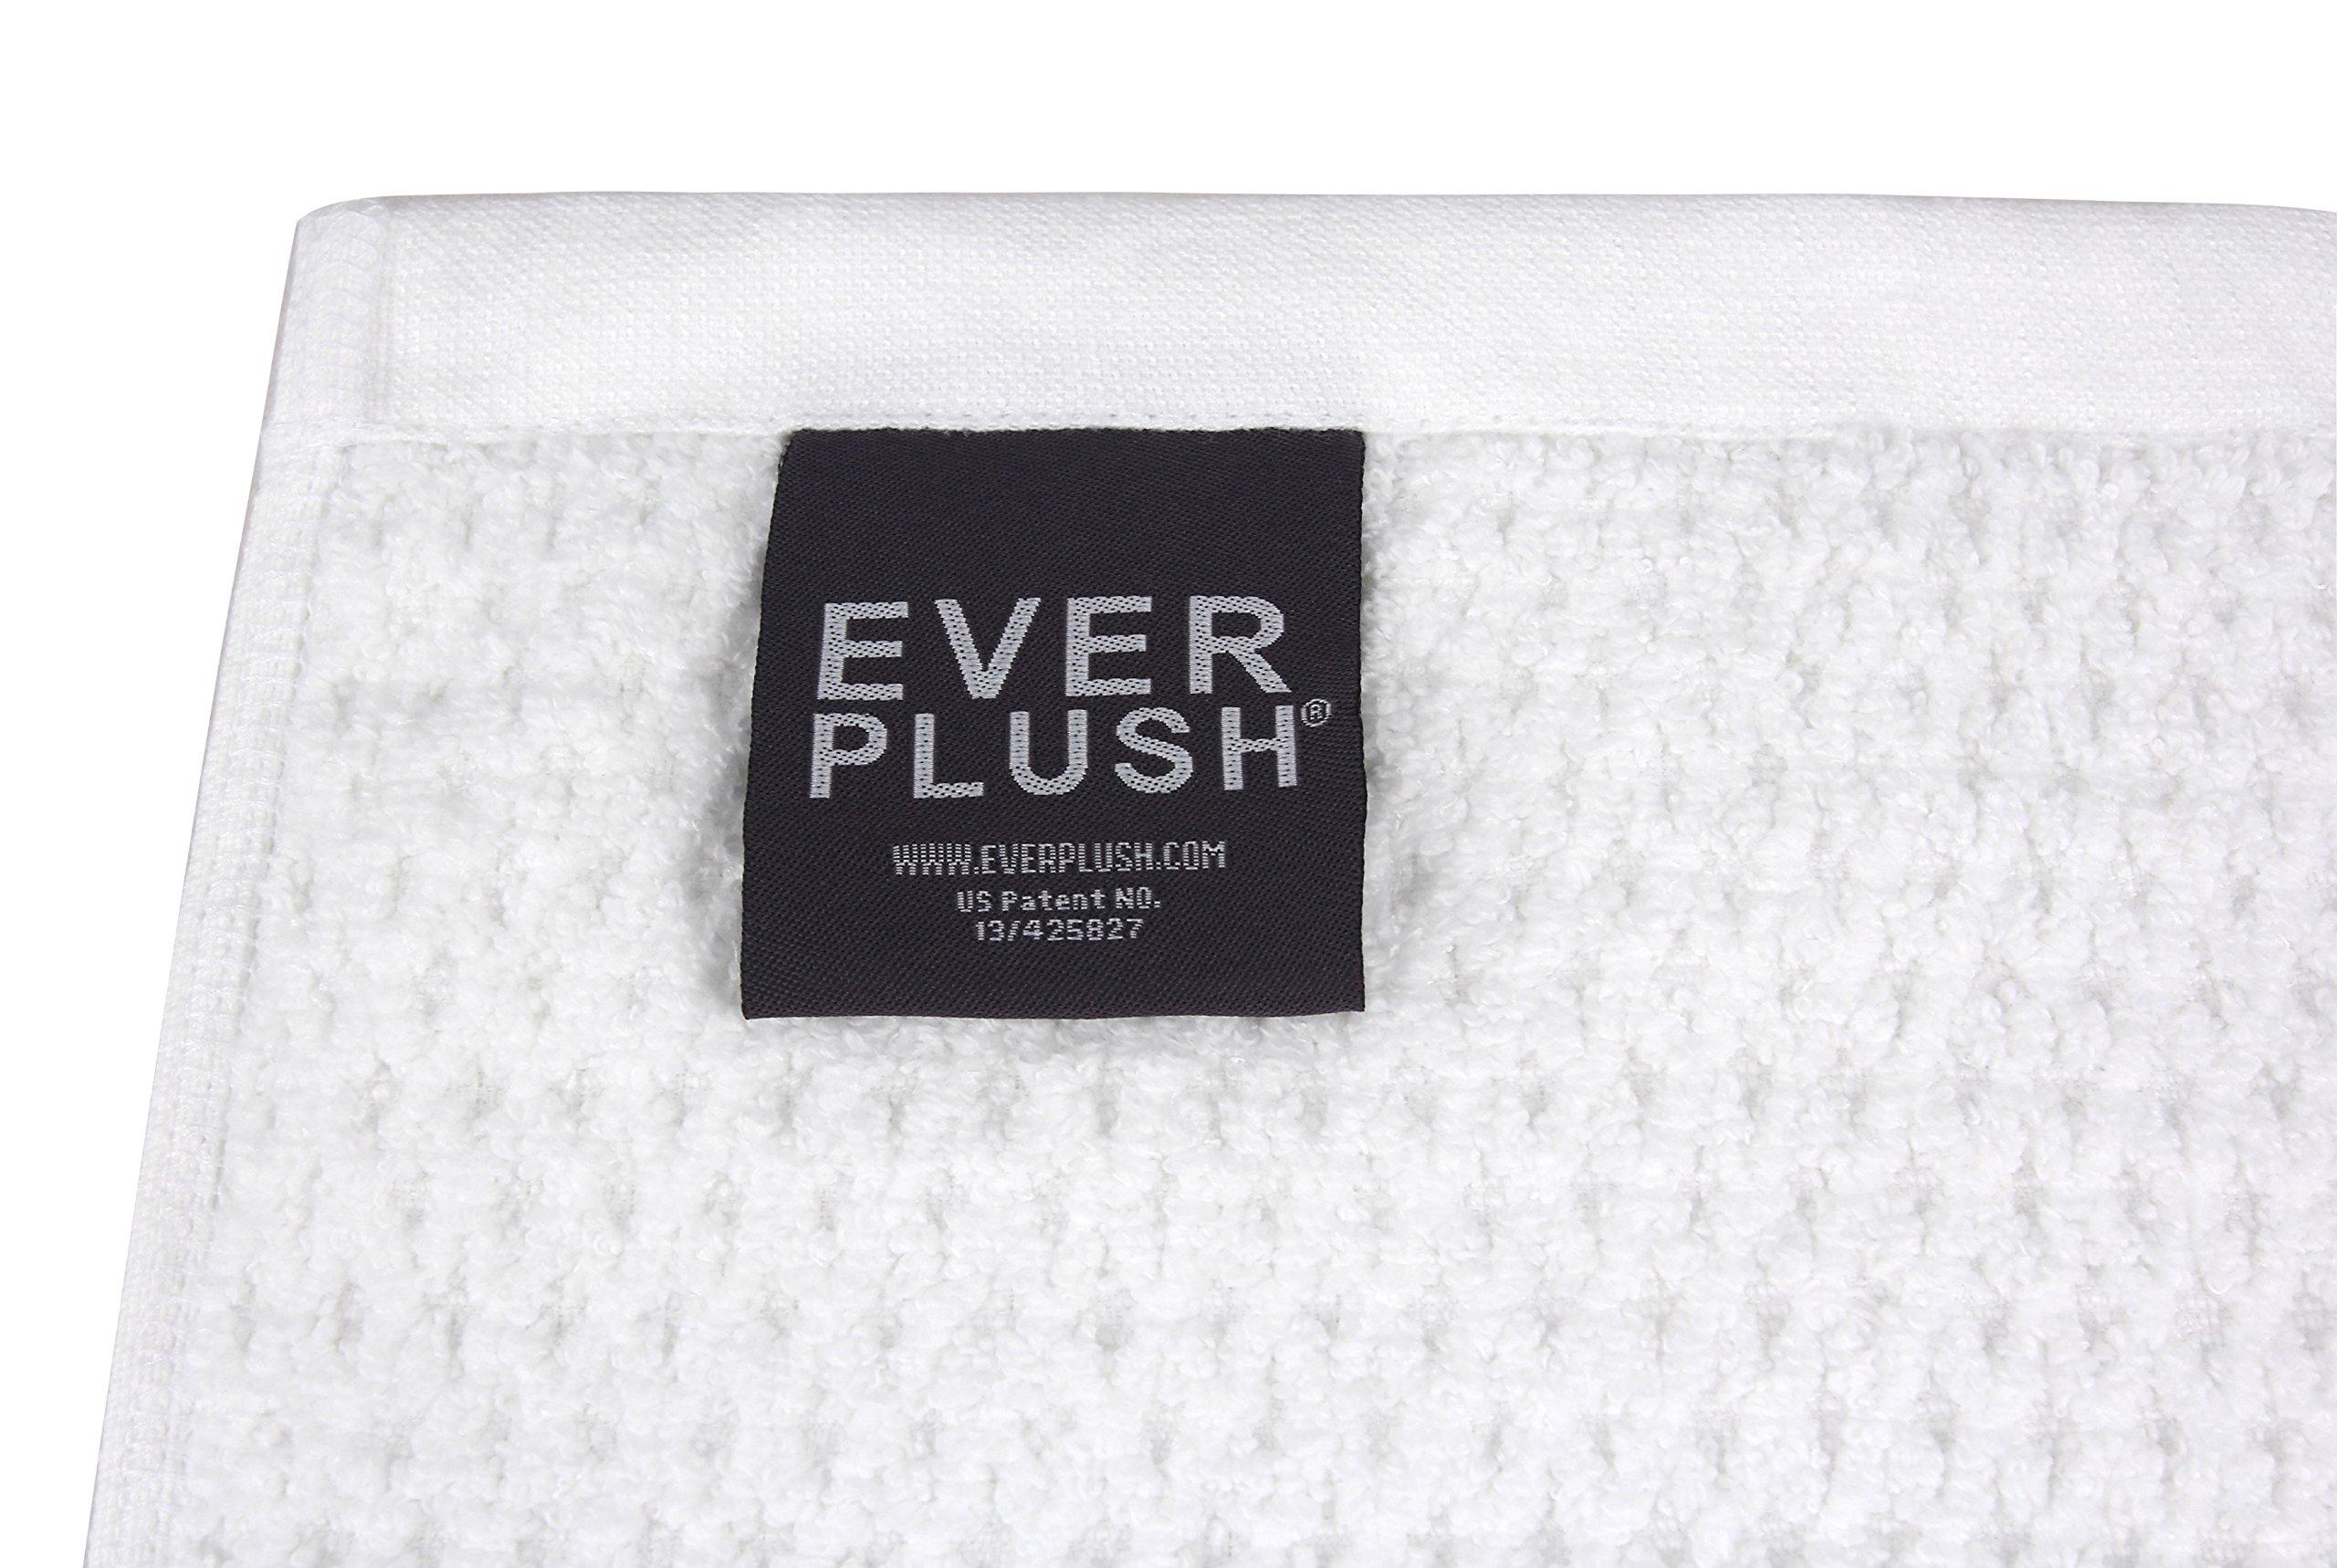 Everplush Diamond Jacquard Bath Sheet 2 Pack in White by Everplush (Image #4)